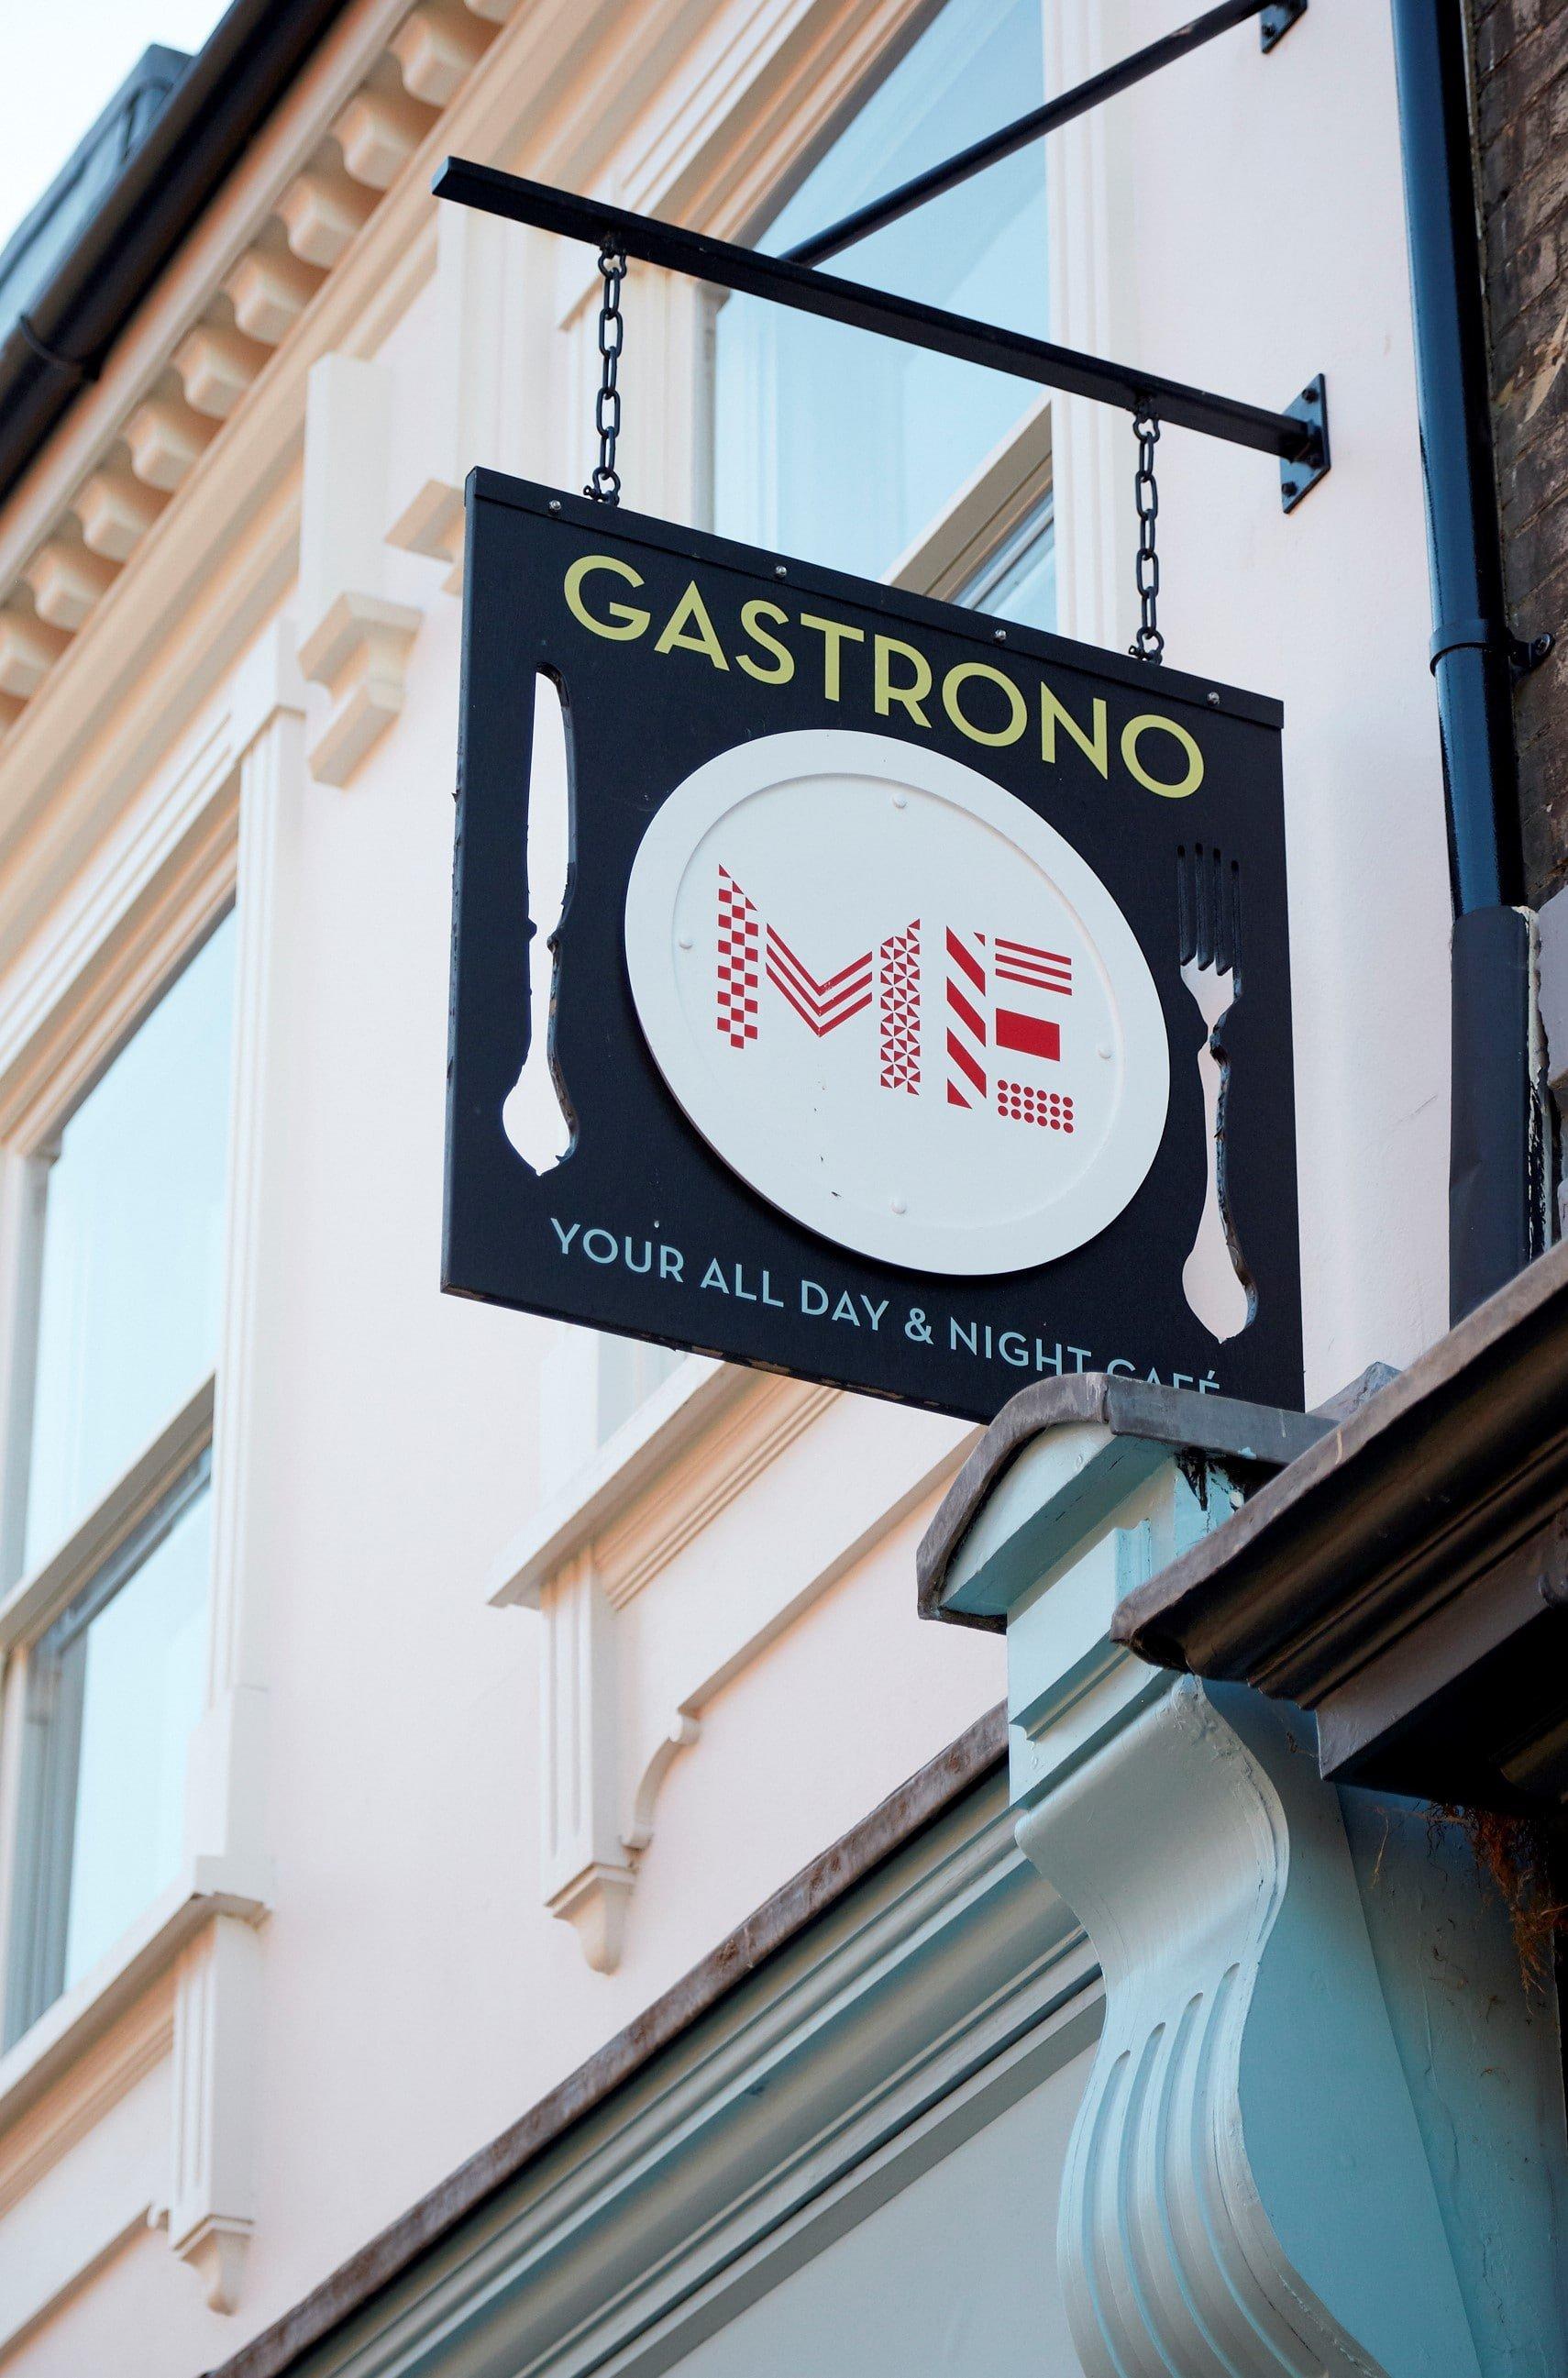 Gastrono-Me, Abbeygate Street, Bury St Edmunds